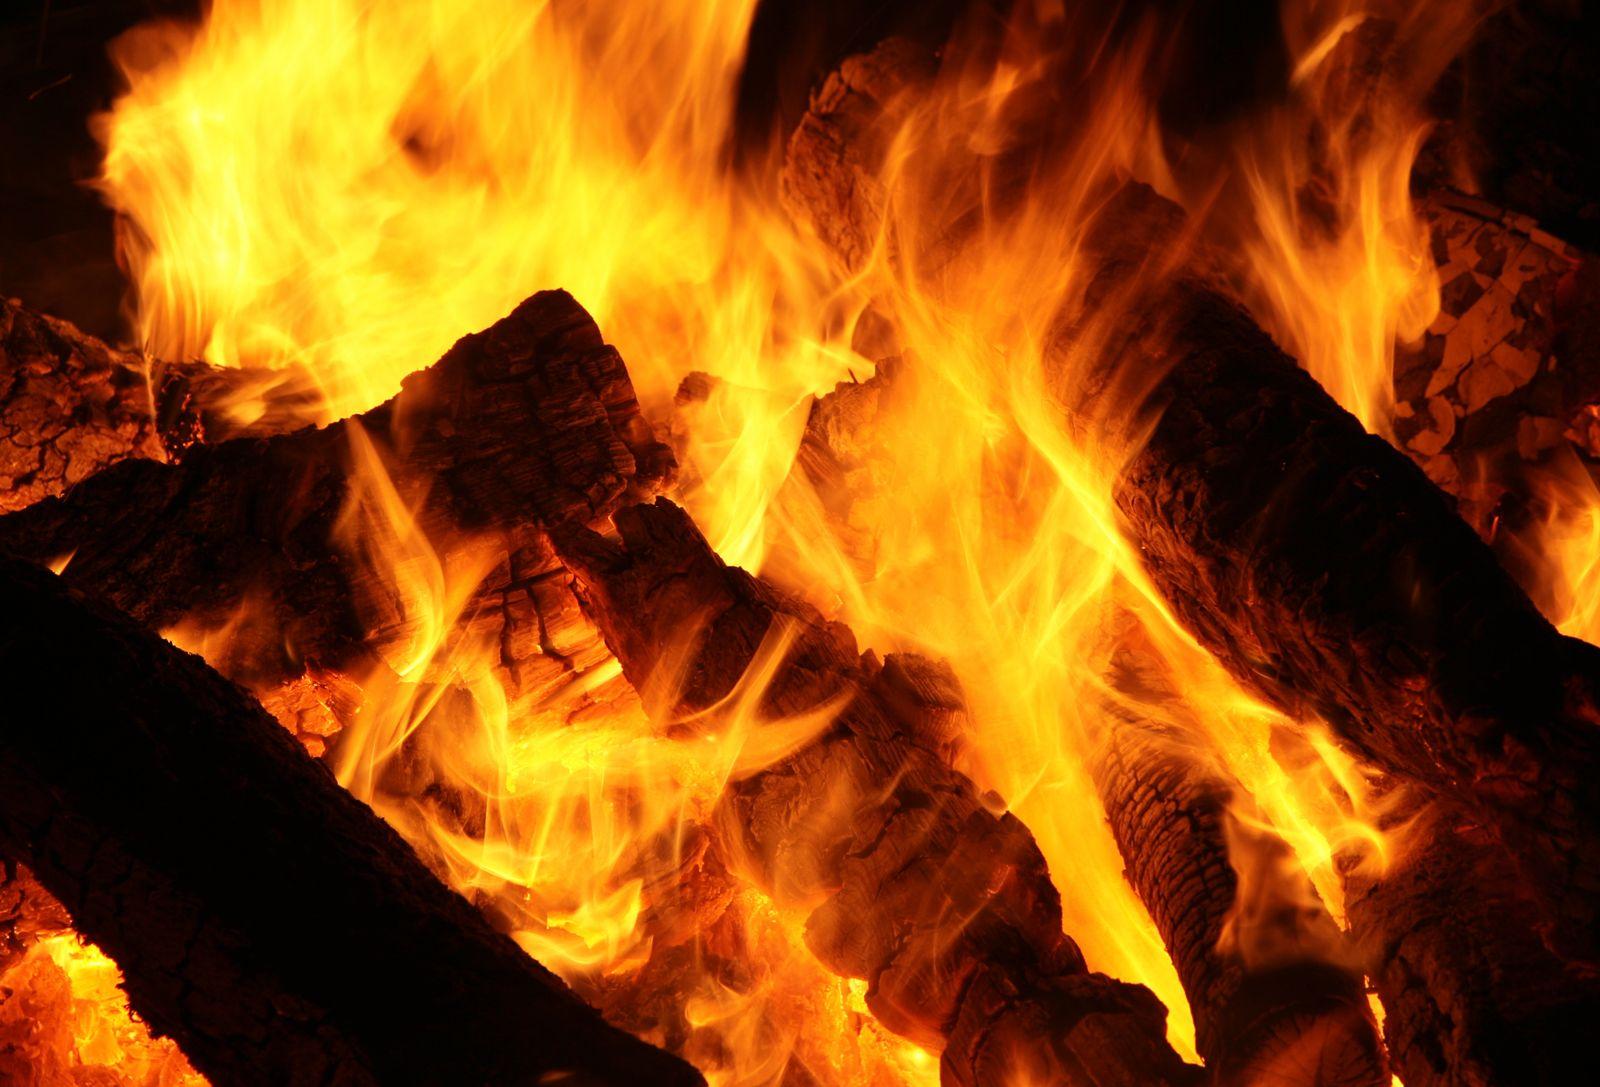 Kaminfeuer / Feuer / Brennholz / Kamin